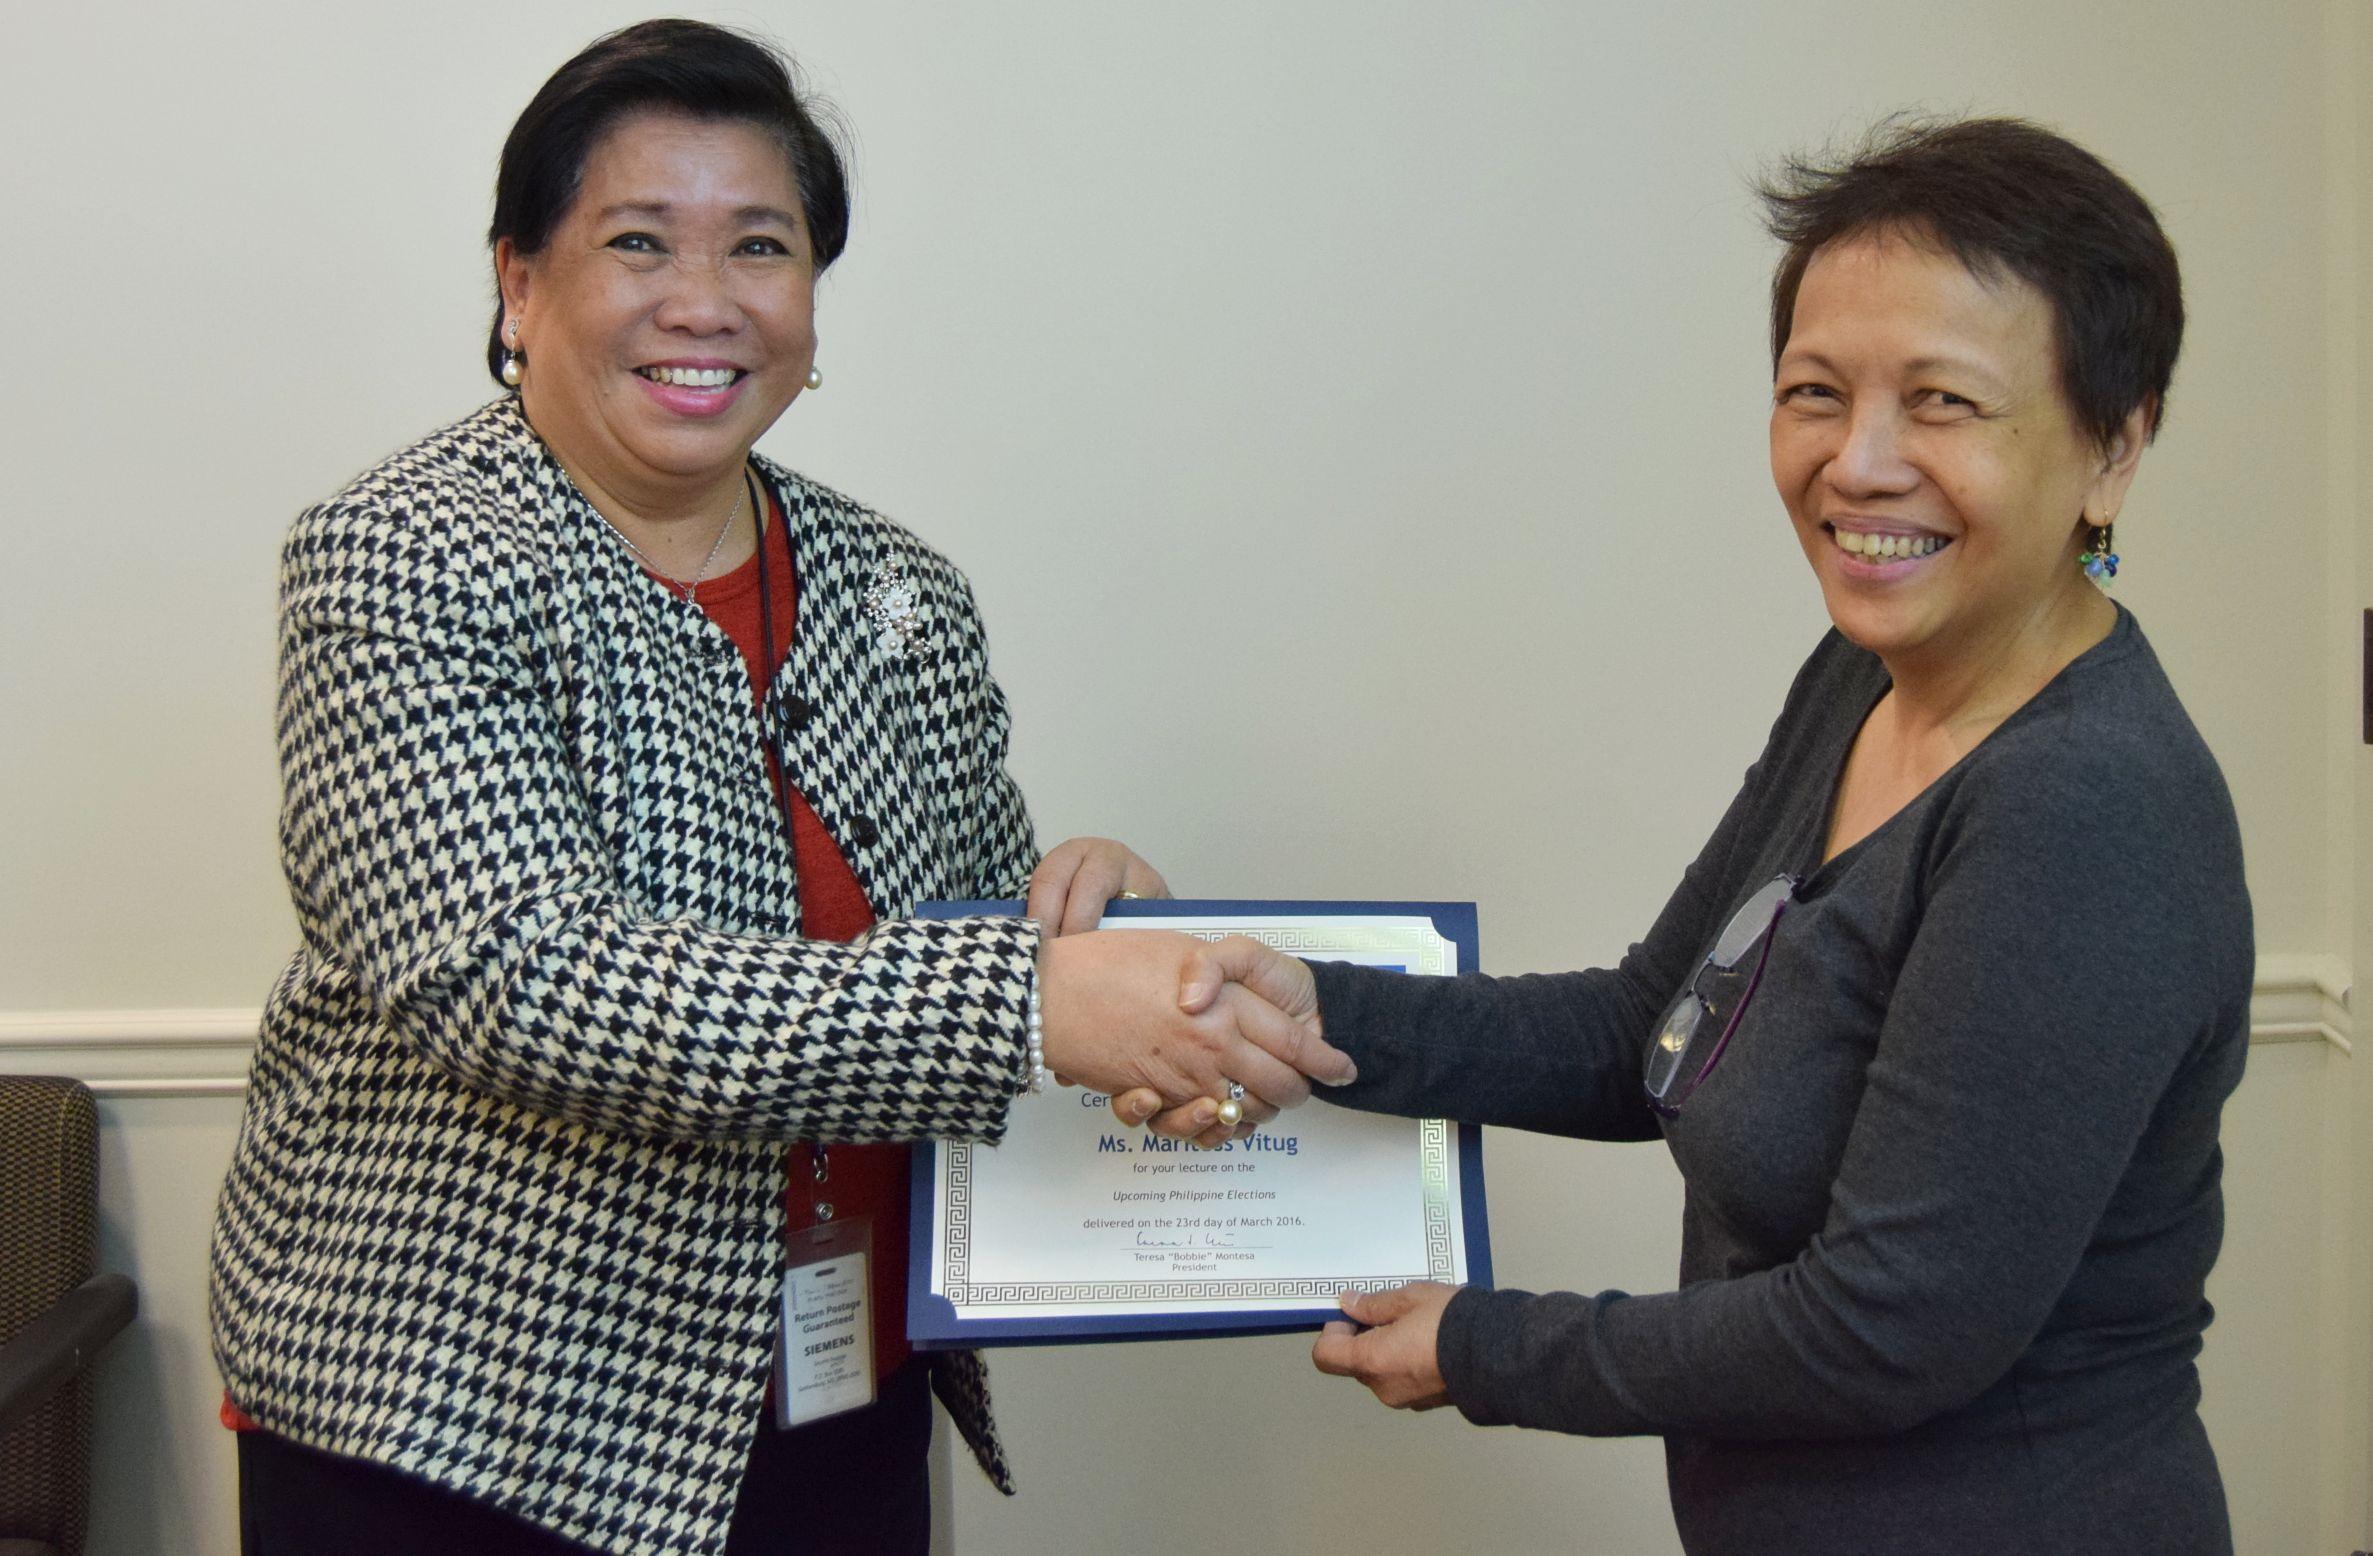 WBIFA President Teresa Montesa presents a Certificate of Appreciation to Marites Vitug